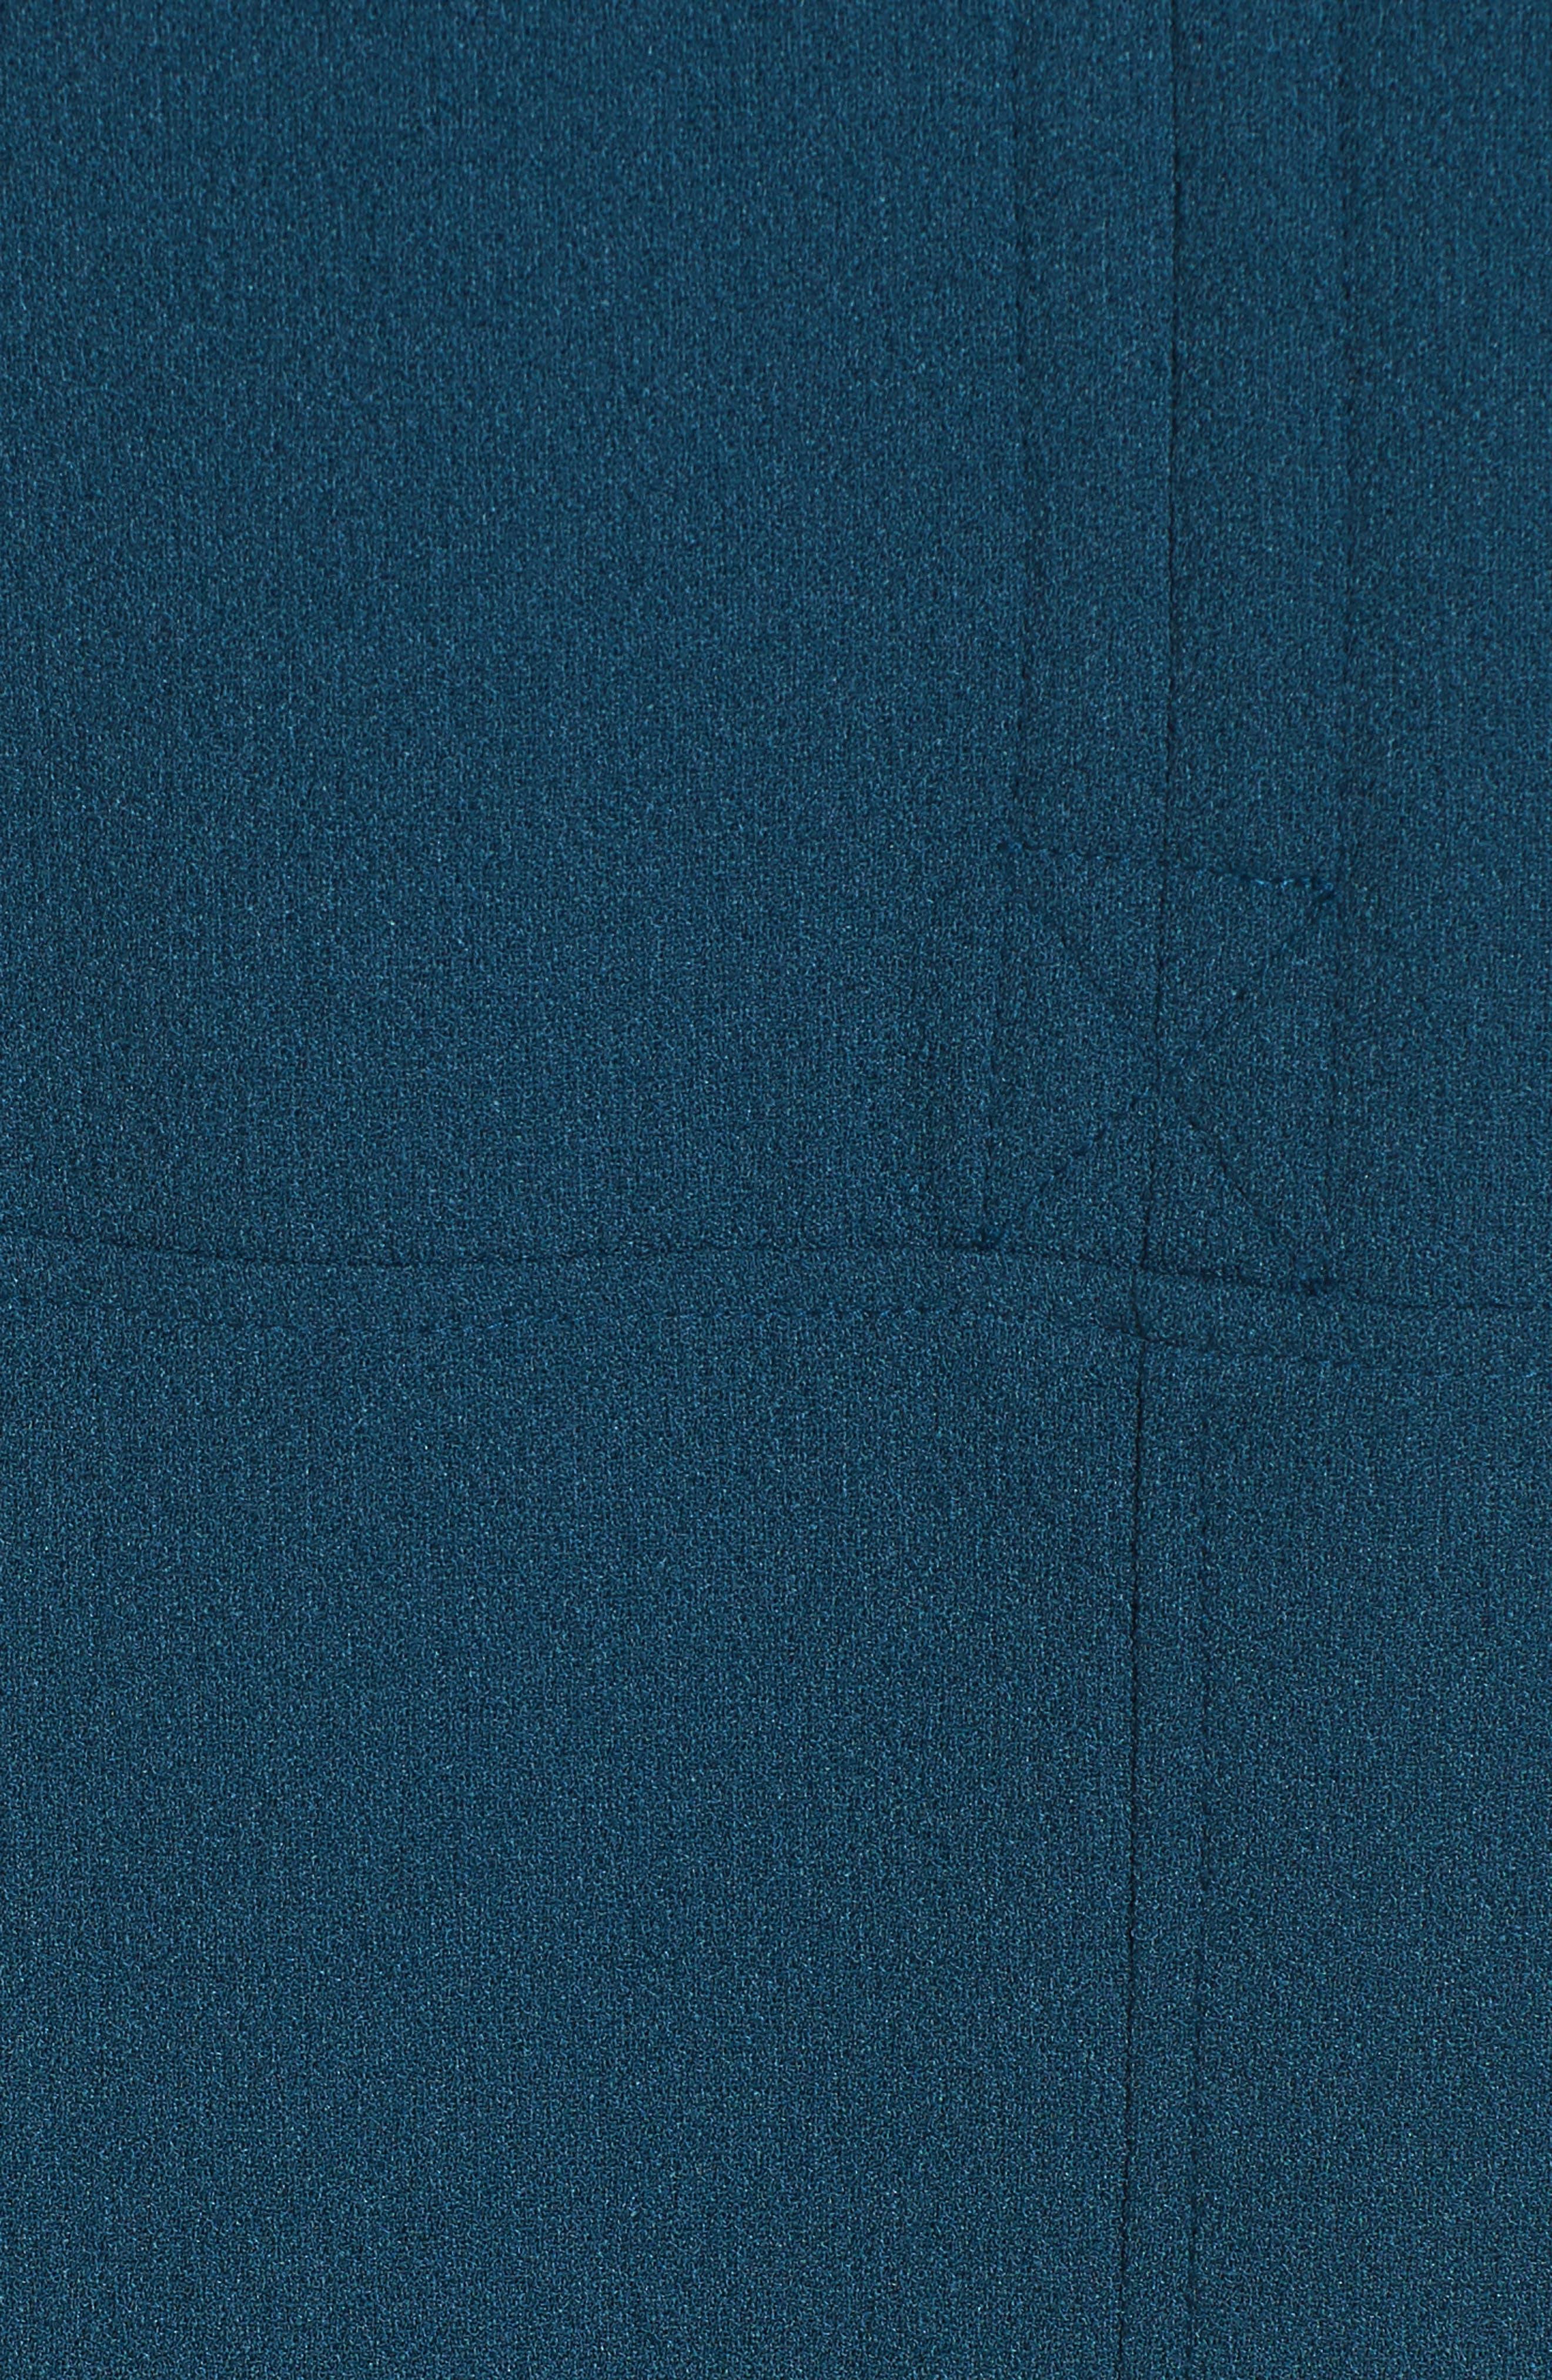 Hailey Crepe Dress,                             Alternate thumbnail 124, color,